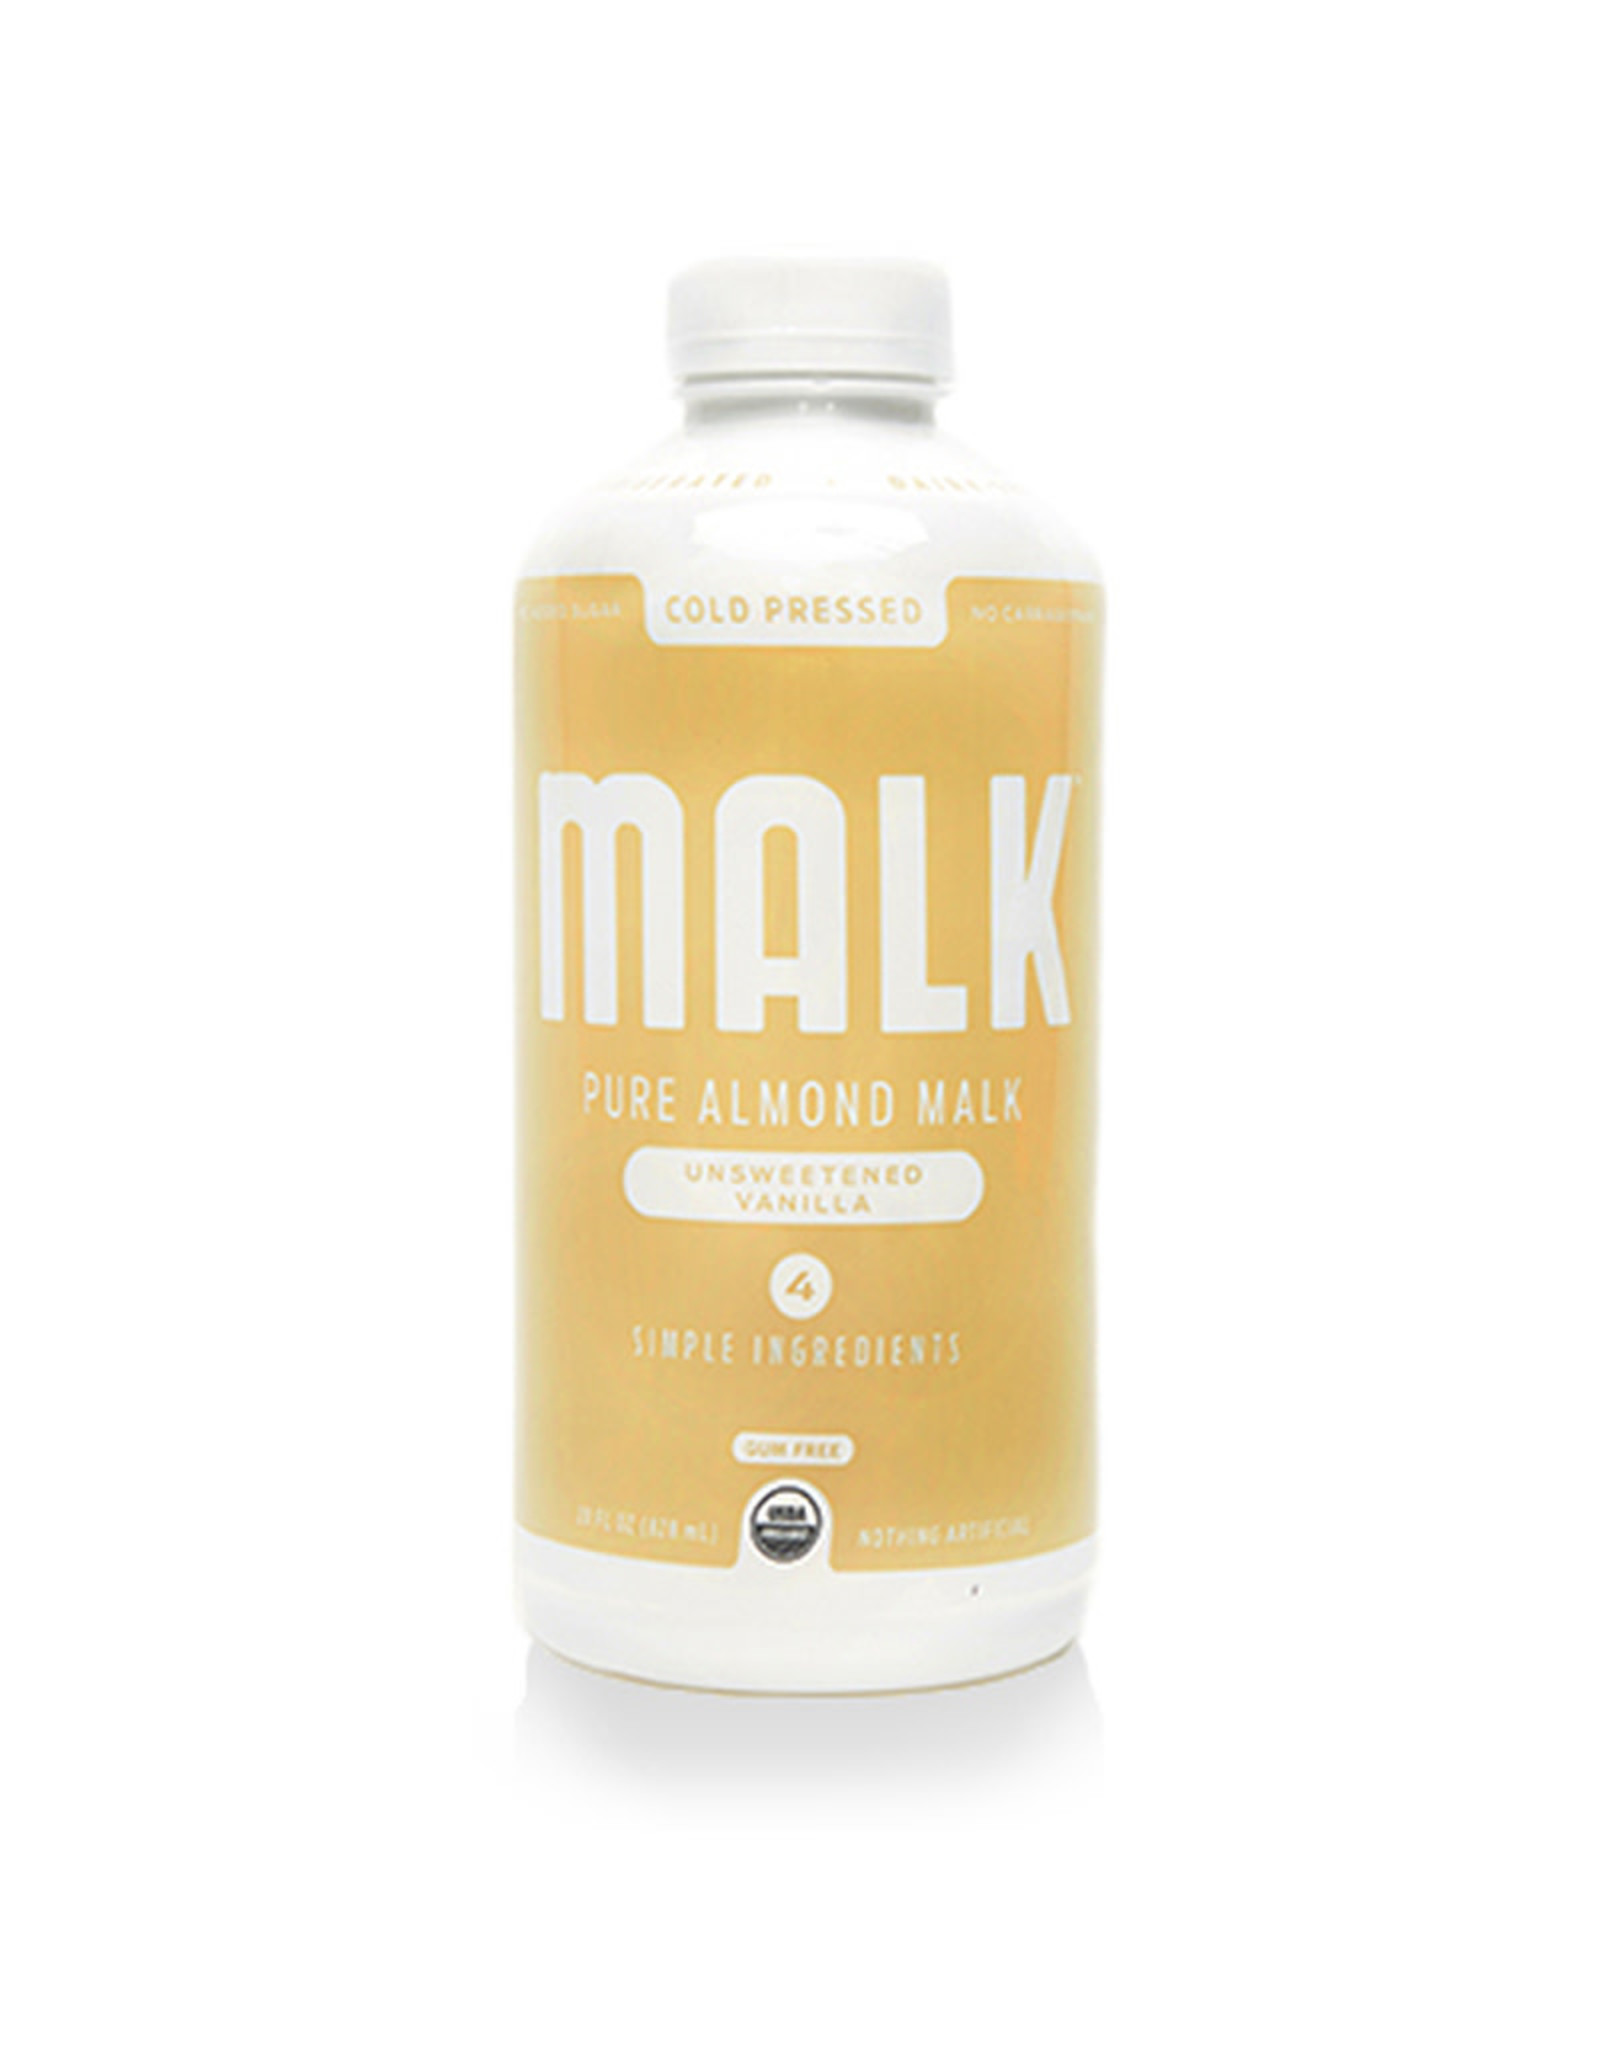 Malk Malk - Unsweetened Almond, Original (946ml)